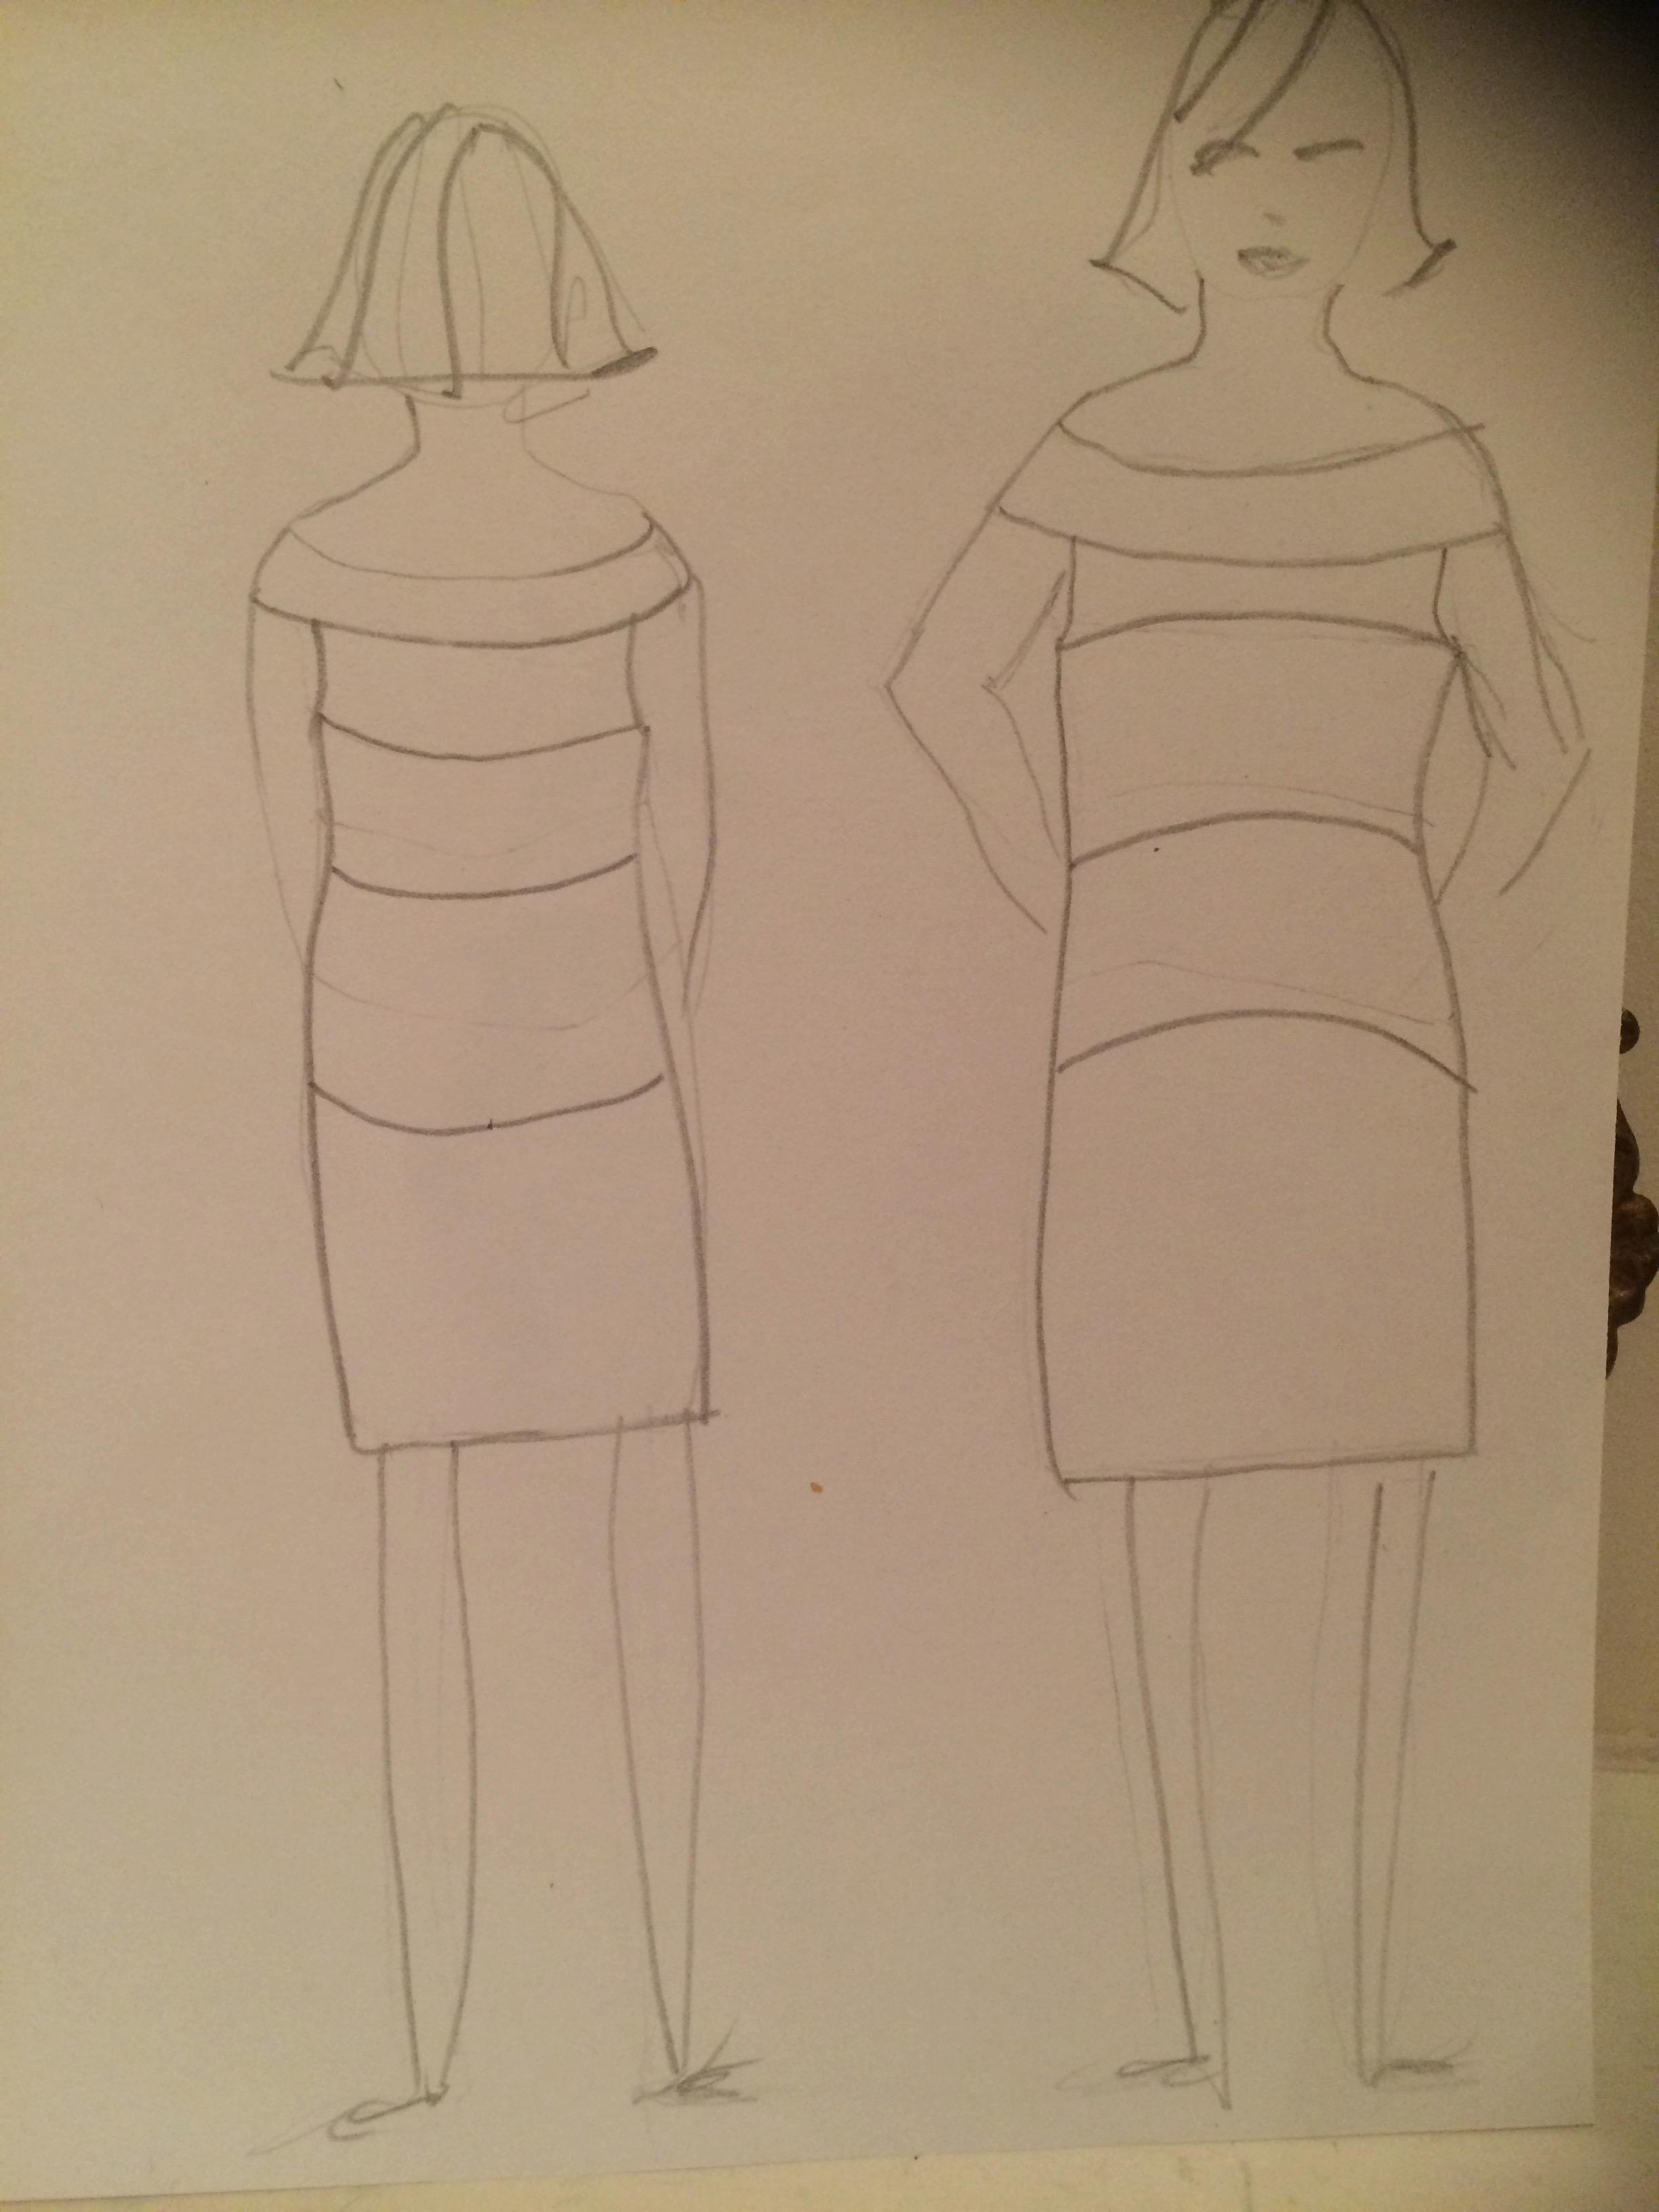 Hooped dress